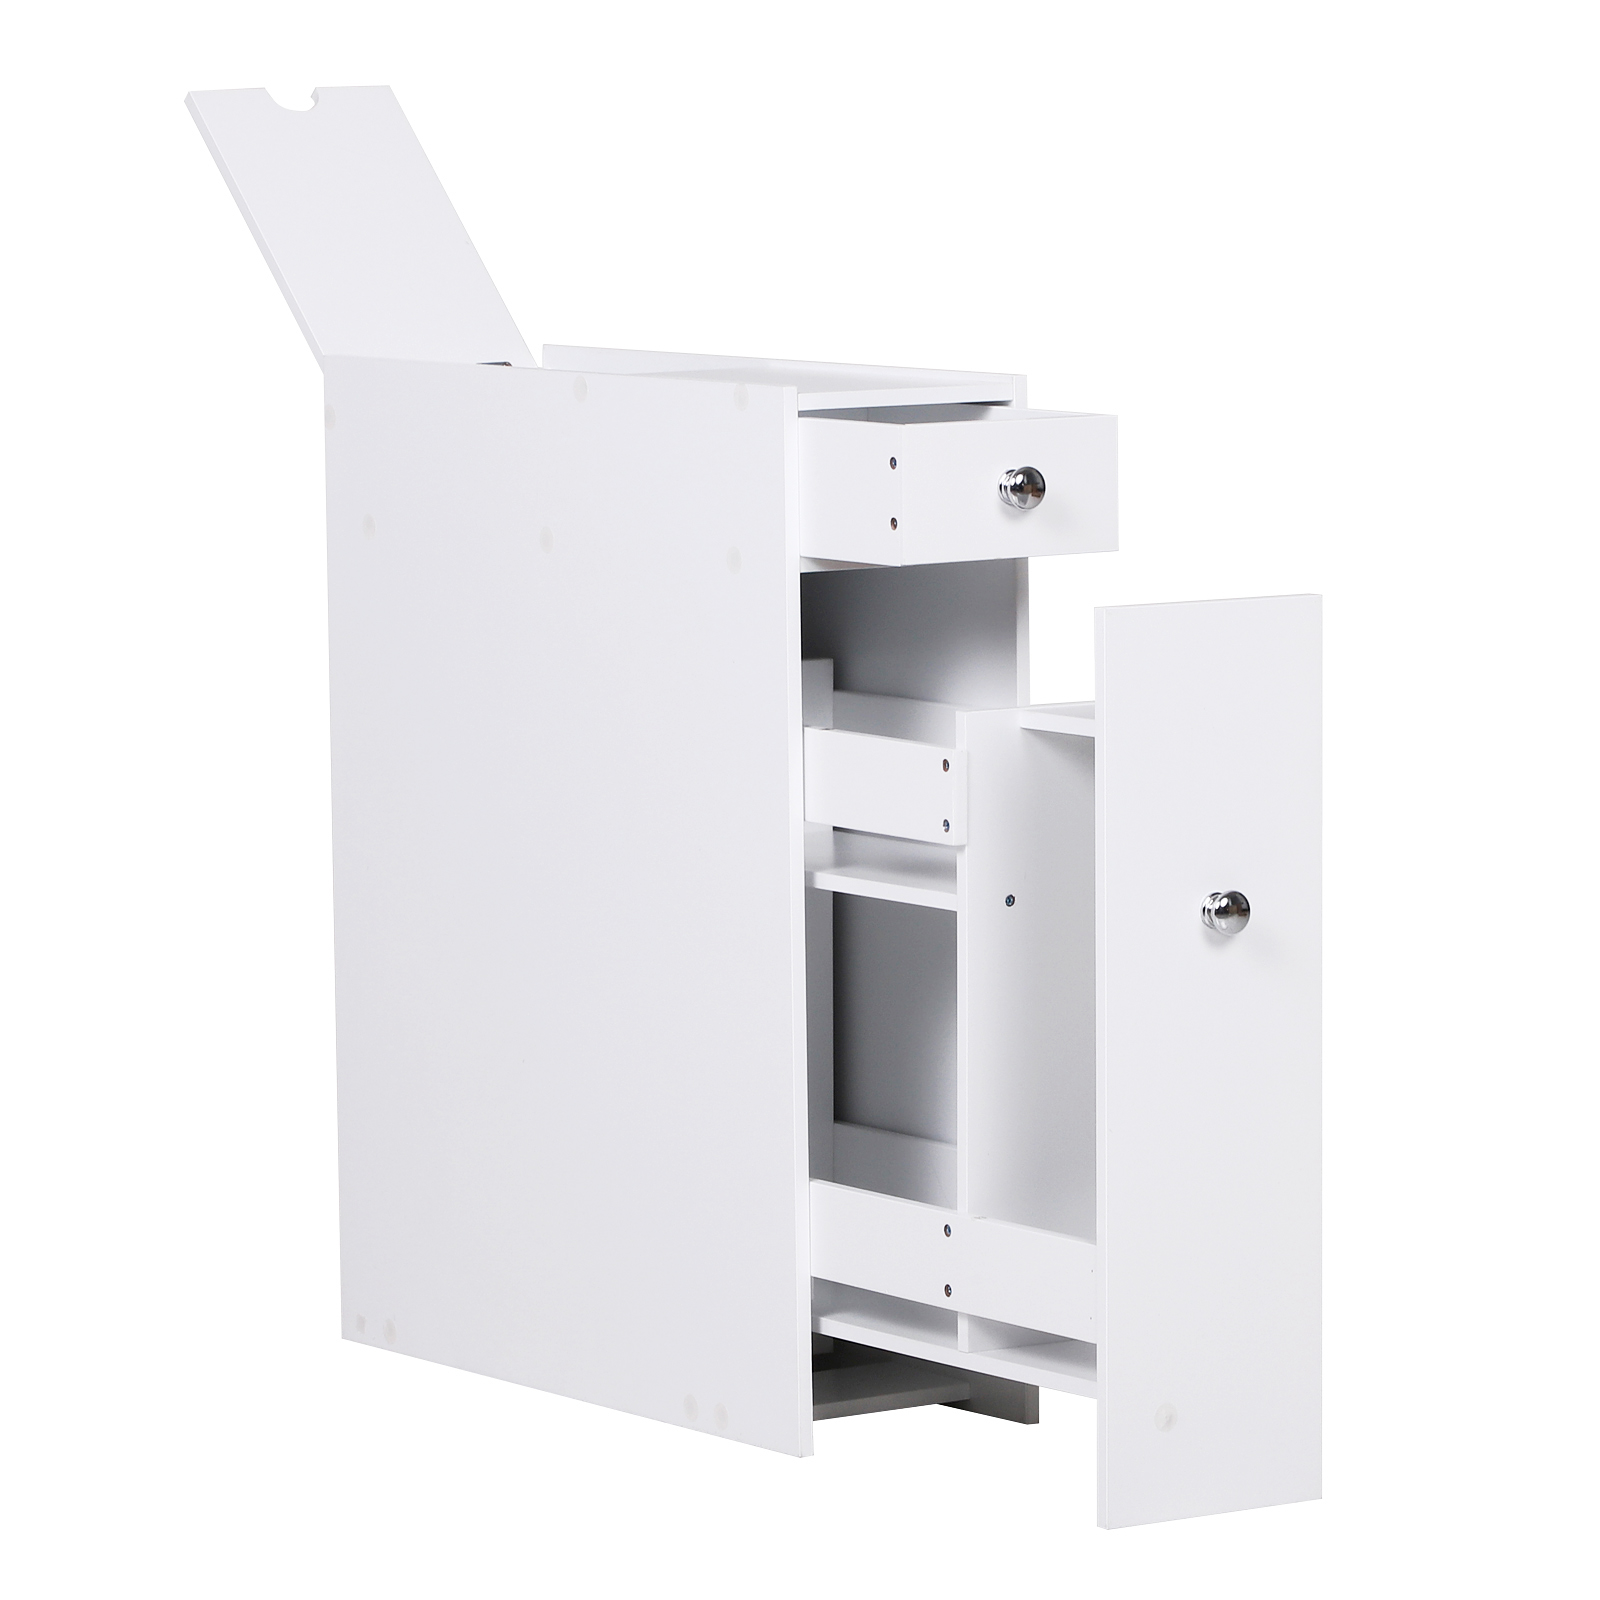 Homcom Slim Floor Cabinet Narrow Wooden Storage With Drawers Bathroom White Ebay